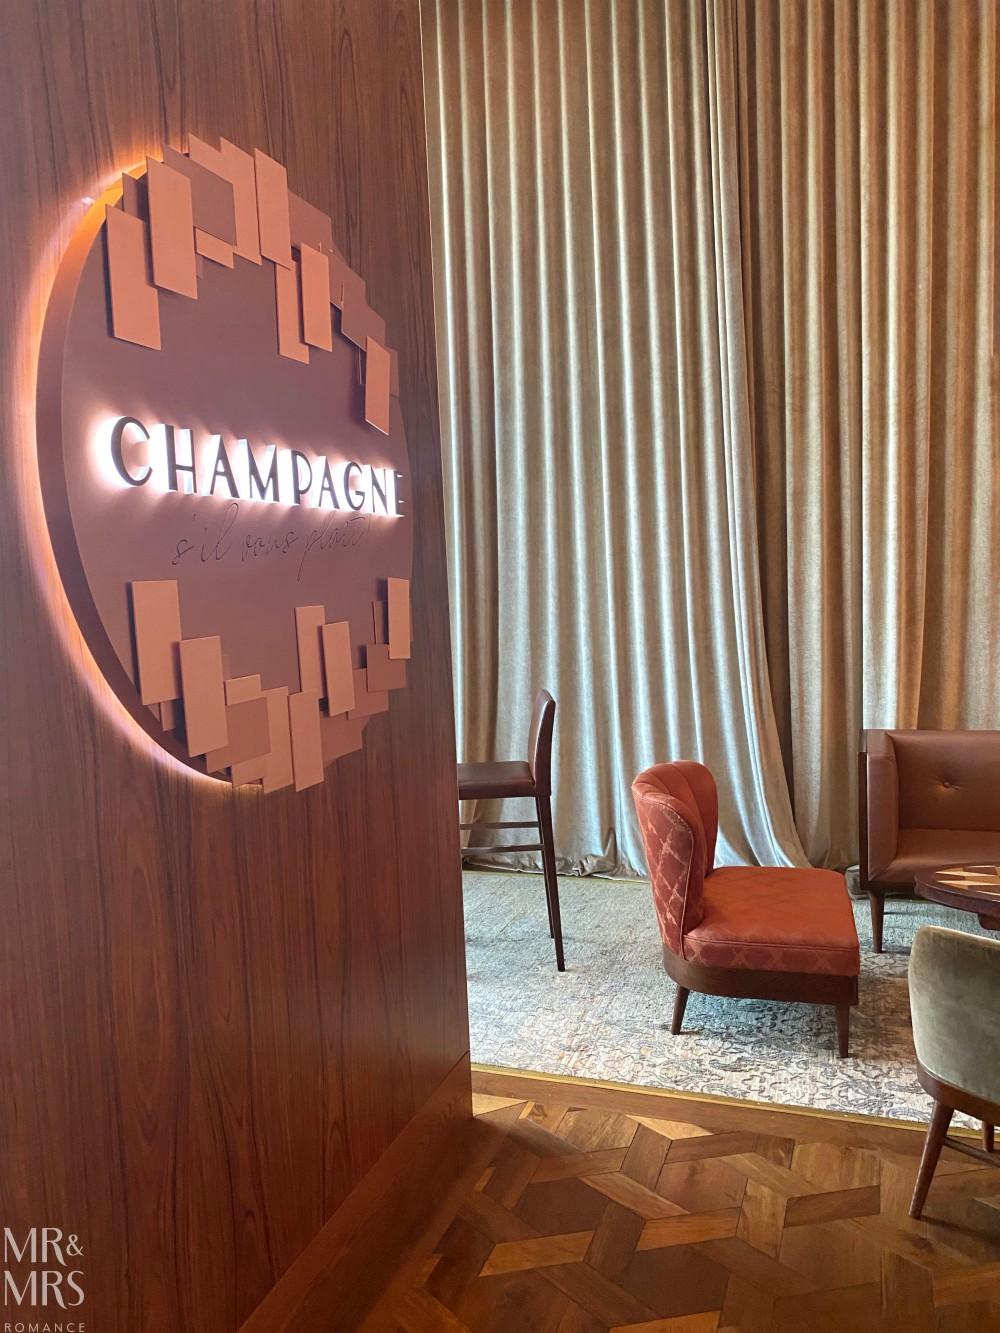 TravMedia Summit Sofitel Darling Harbour Champagne Bar